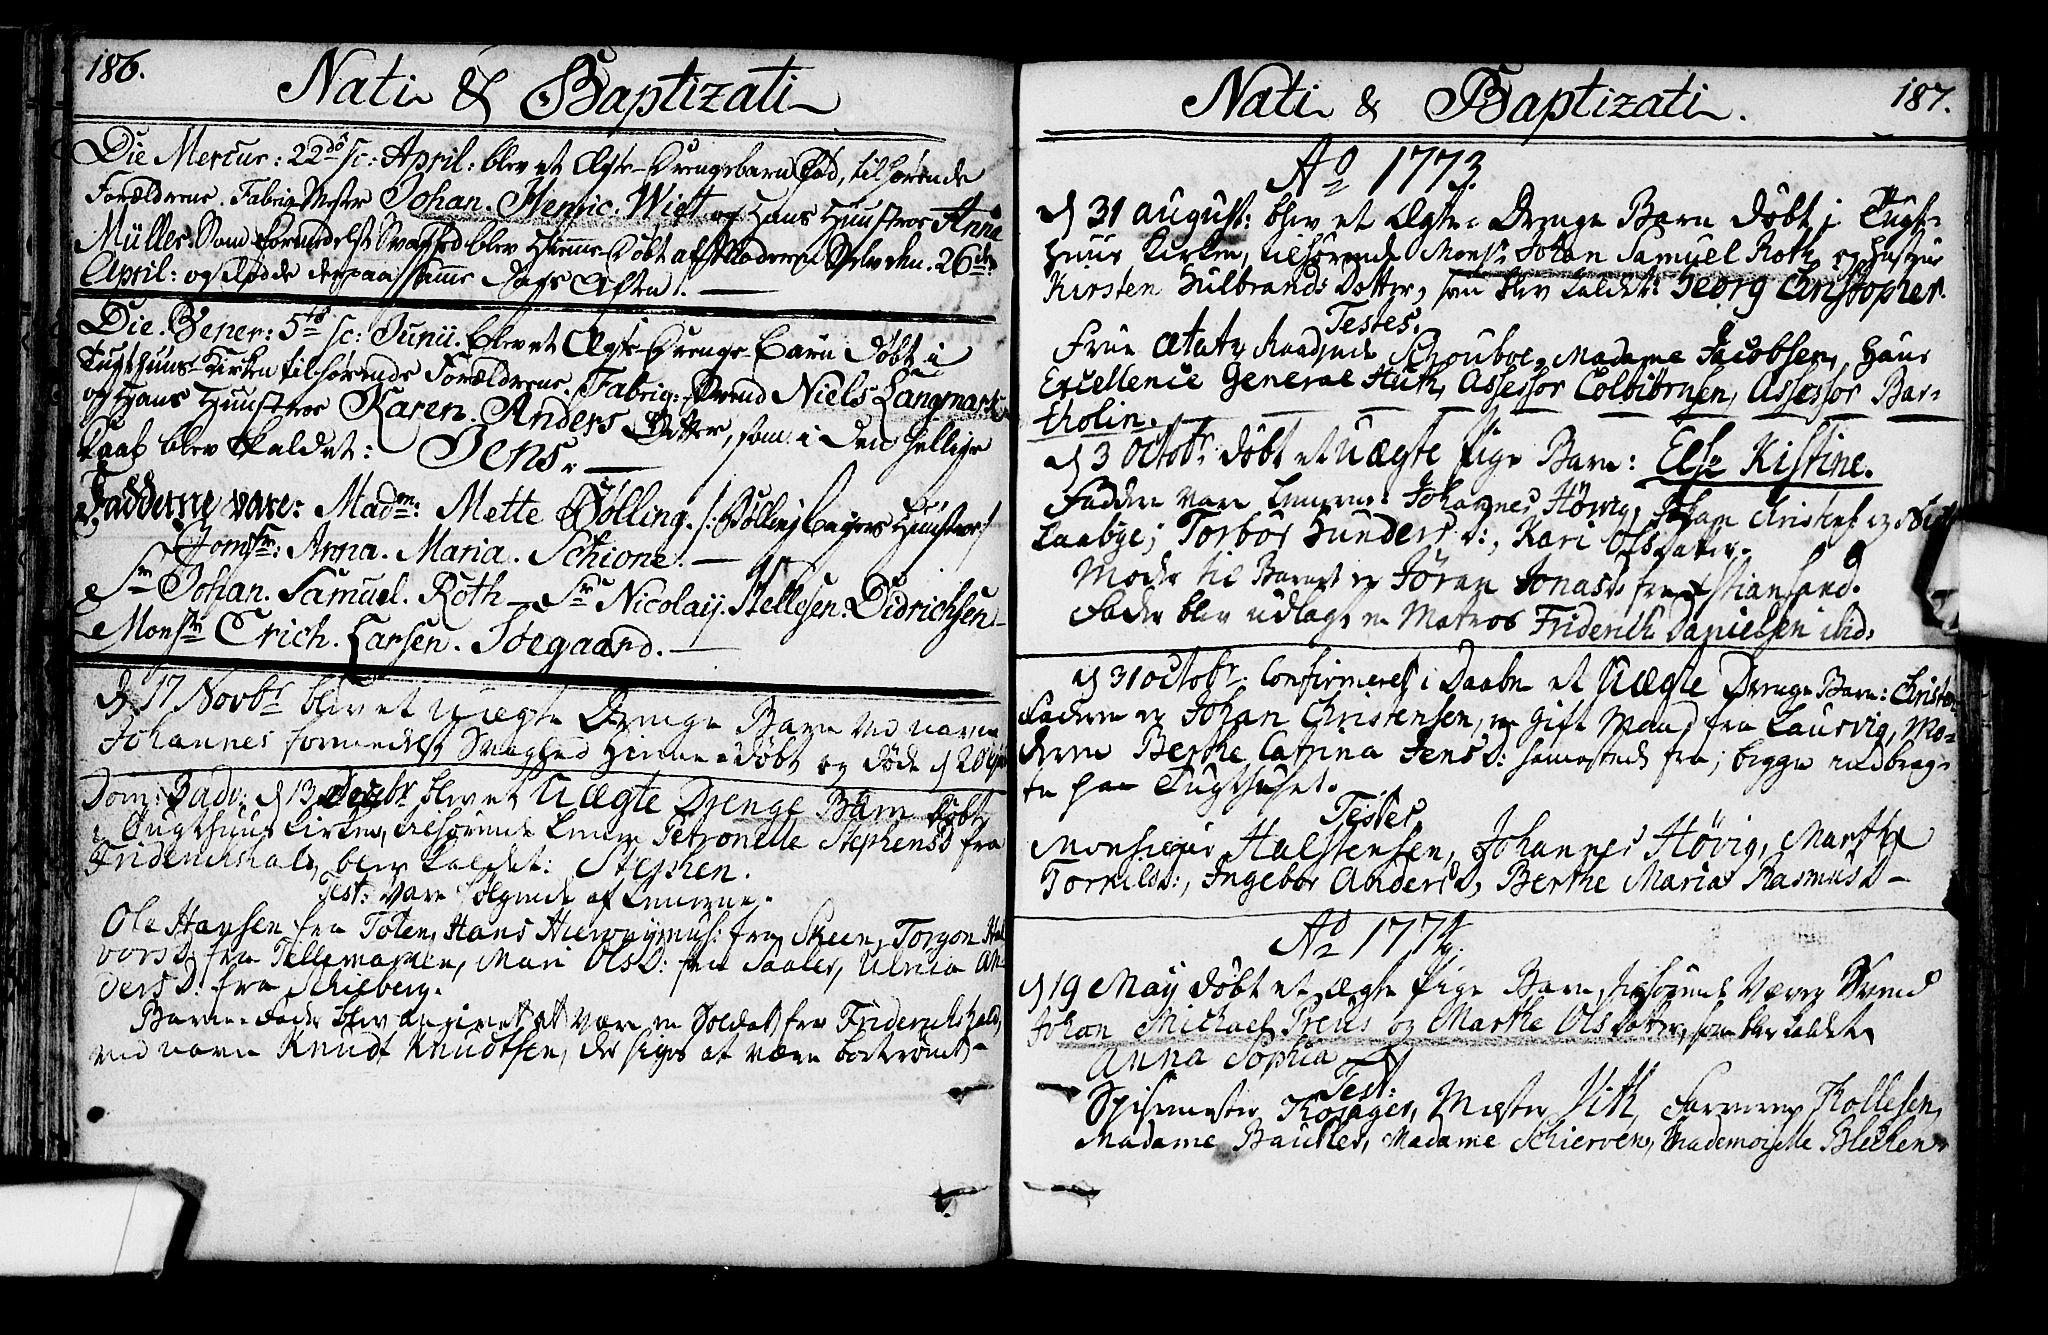 SAO, Kristiania tukthusprest Kirkebøker, F/Fa/L0001: Ministerialbok nr. 1, 1758-1828, s. 186-187